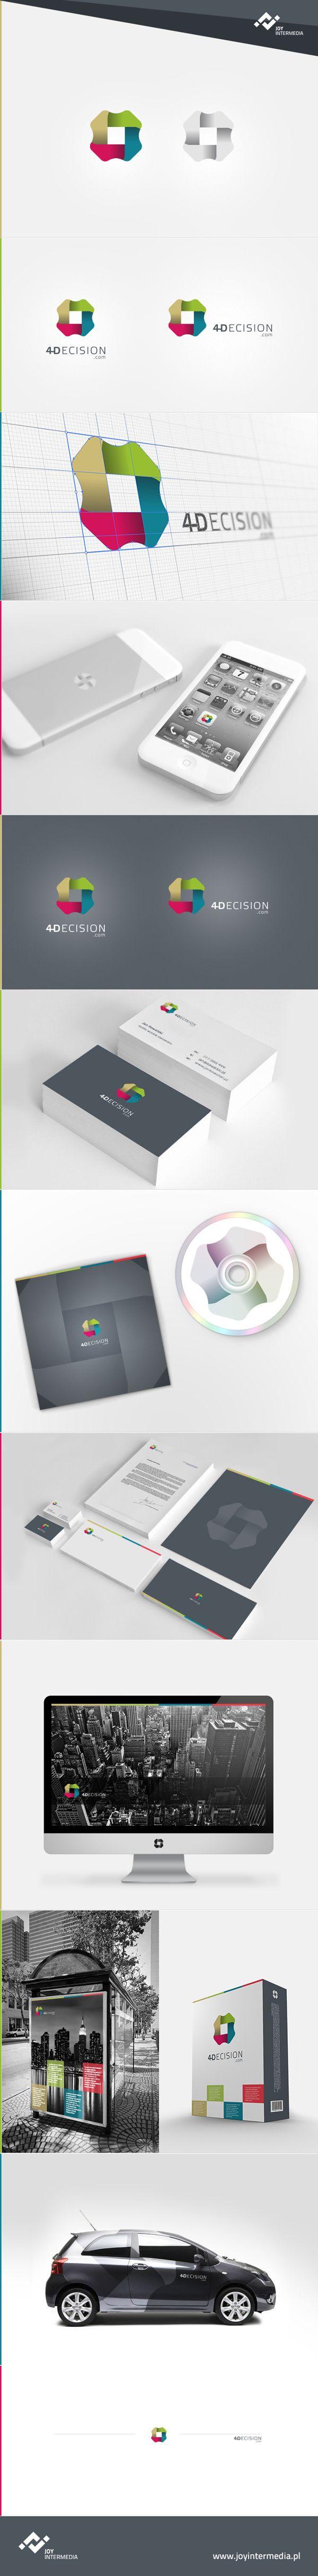 4Decision for Banfi by Piotr Kozak, via #Behance #Branding #Identity #Design